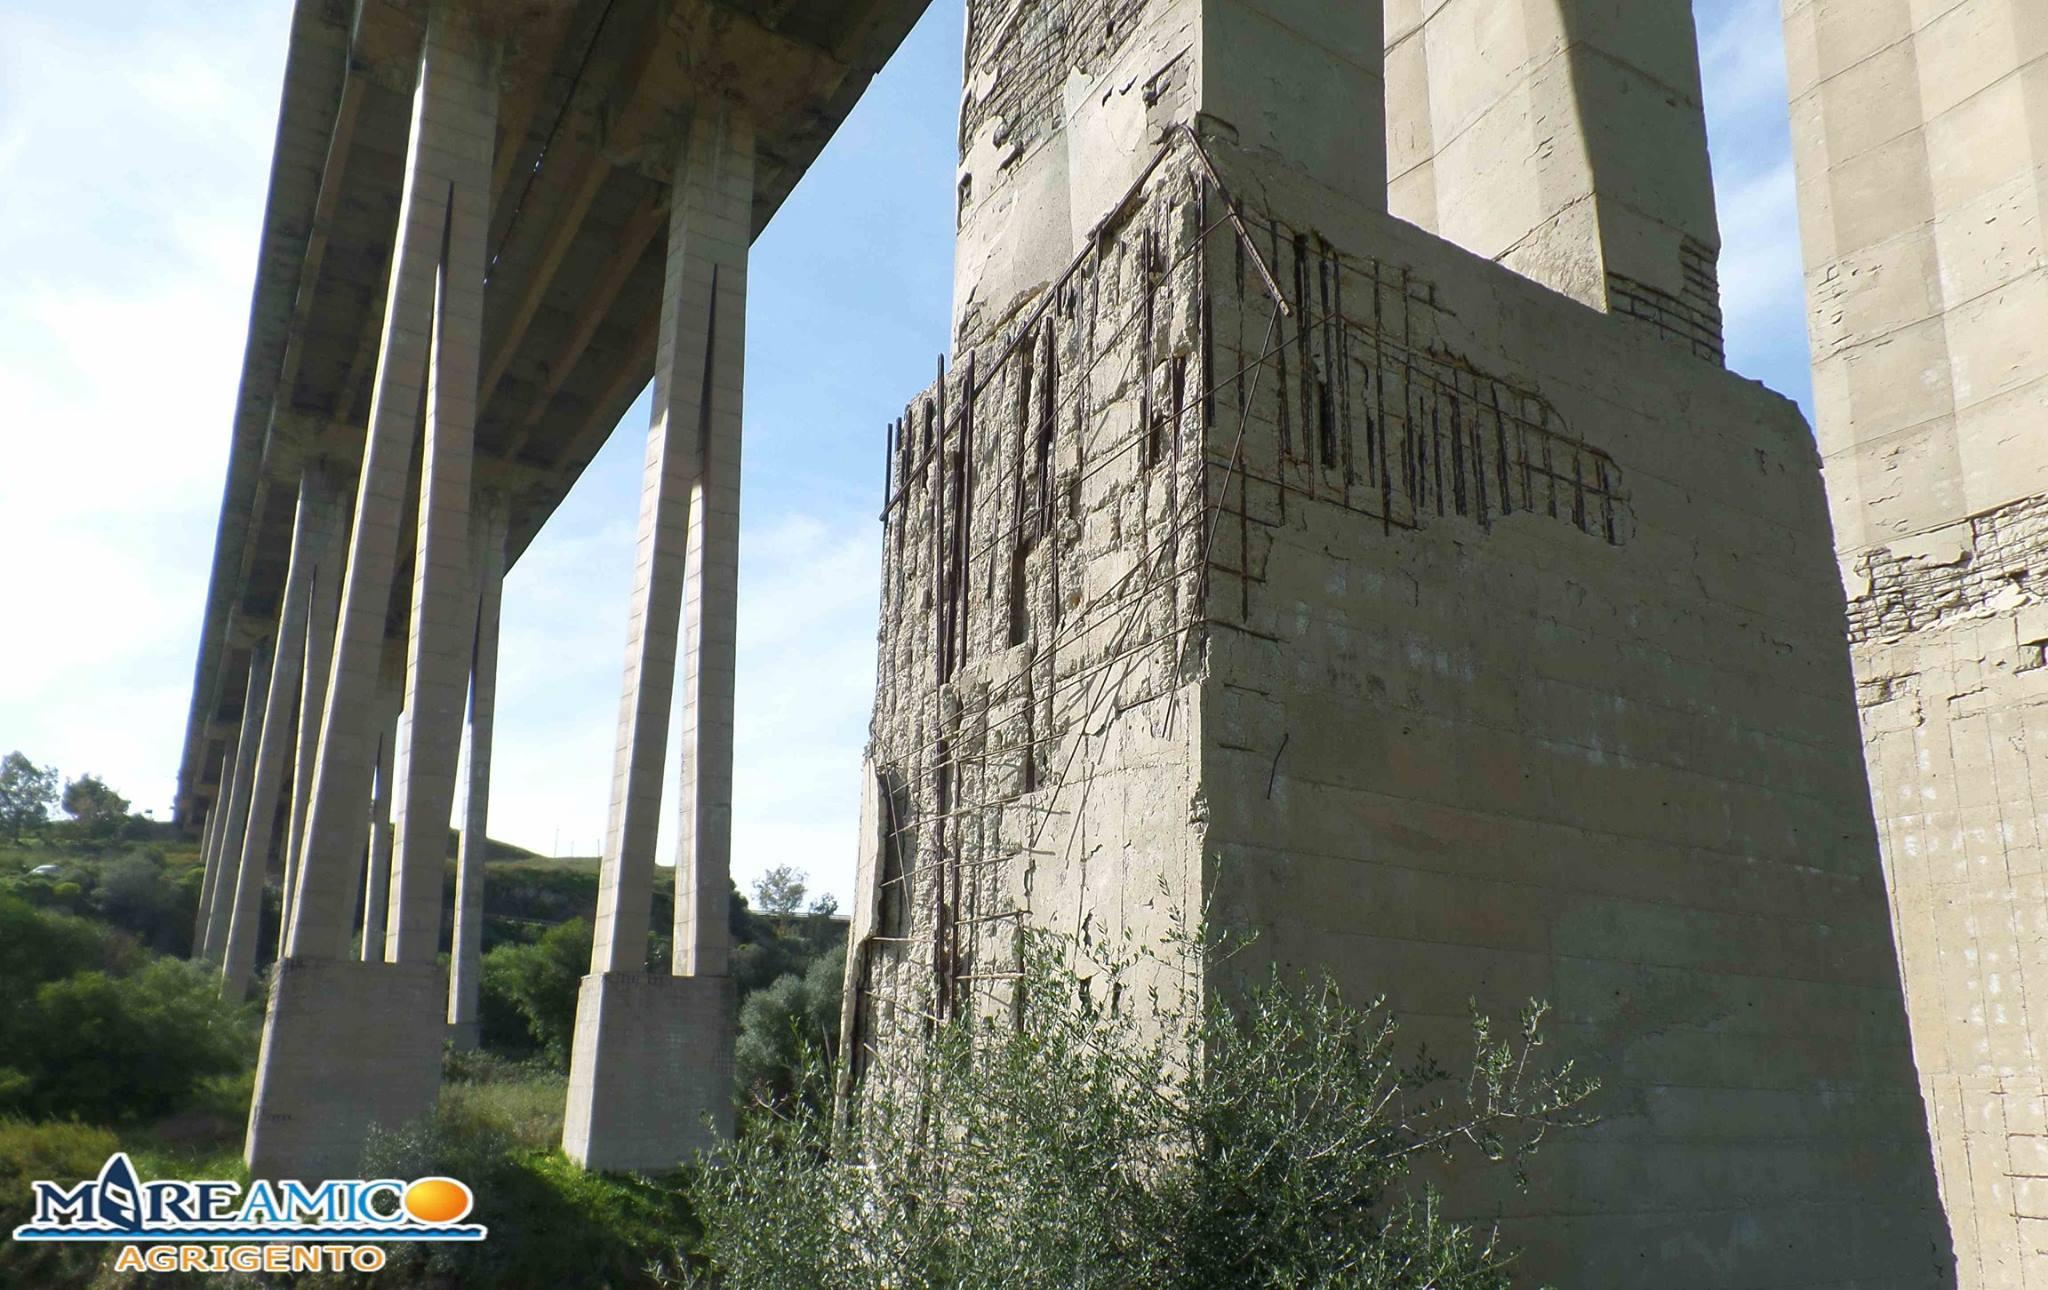 mareamico-agrigento-ponte-morandi-2.jpg